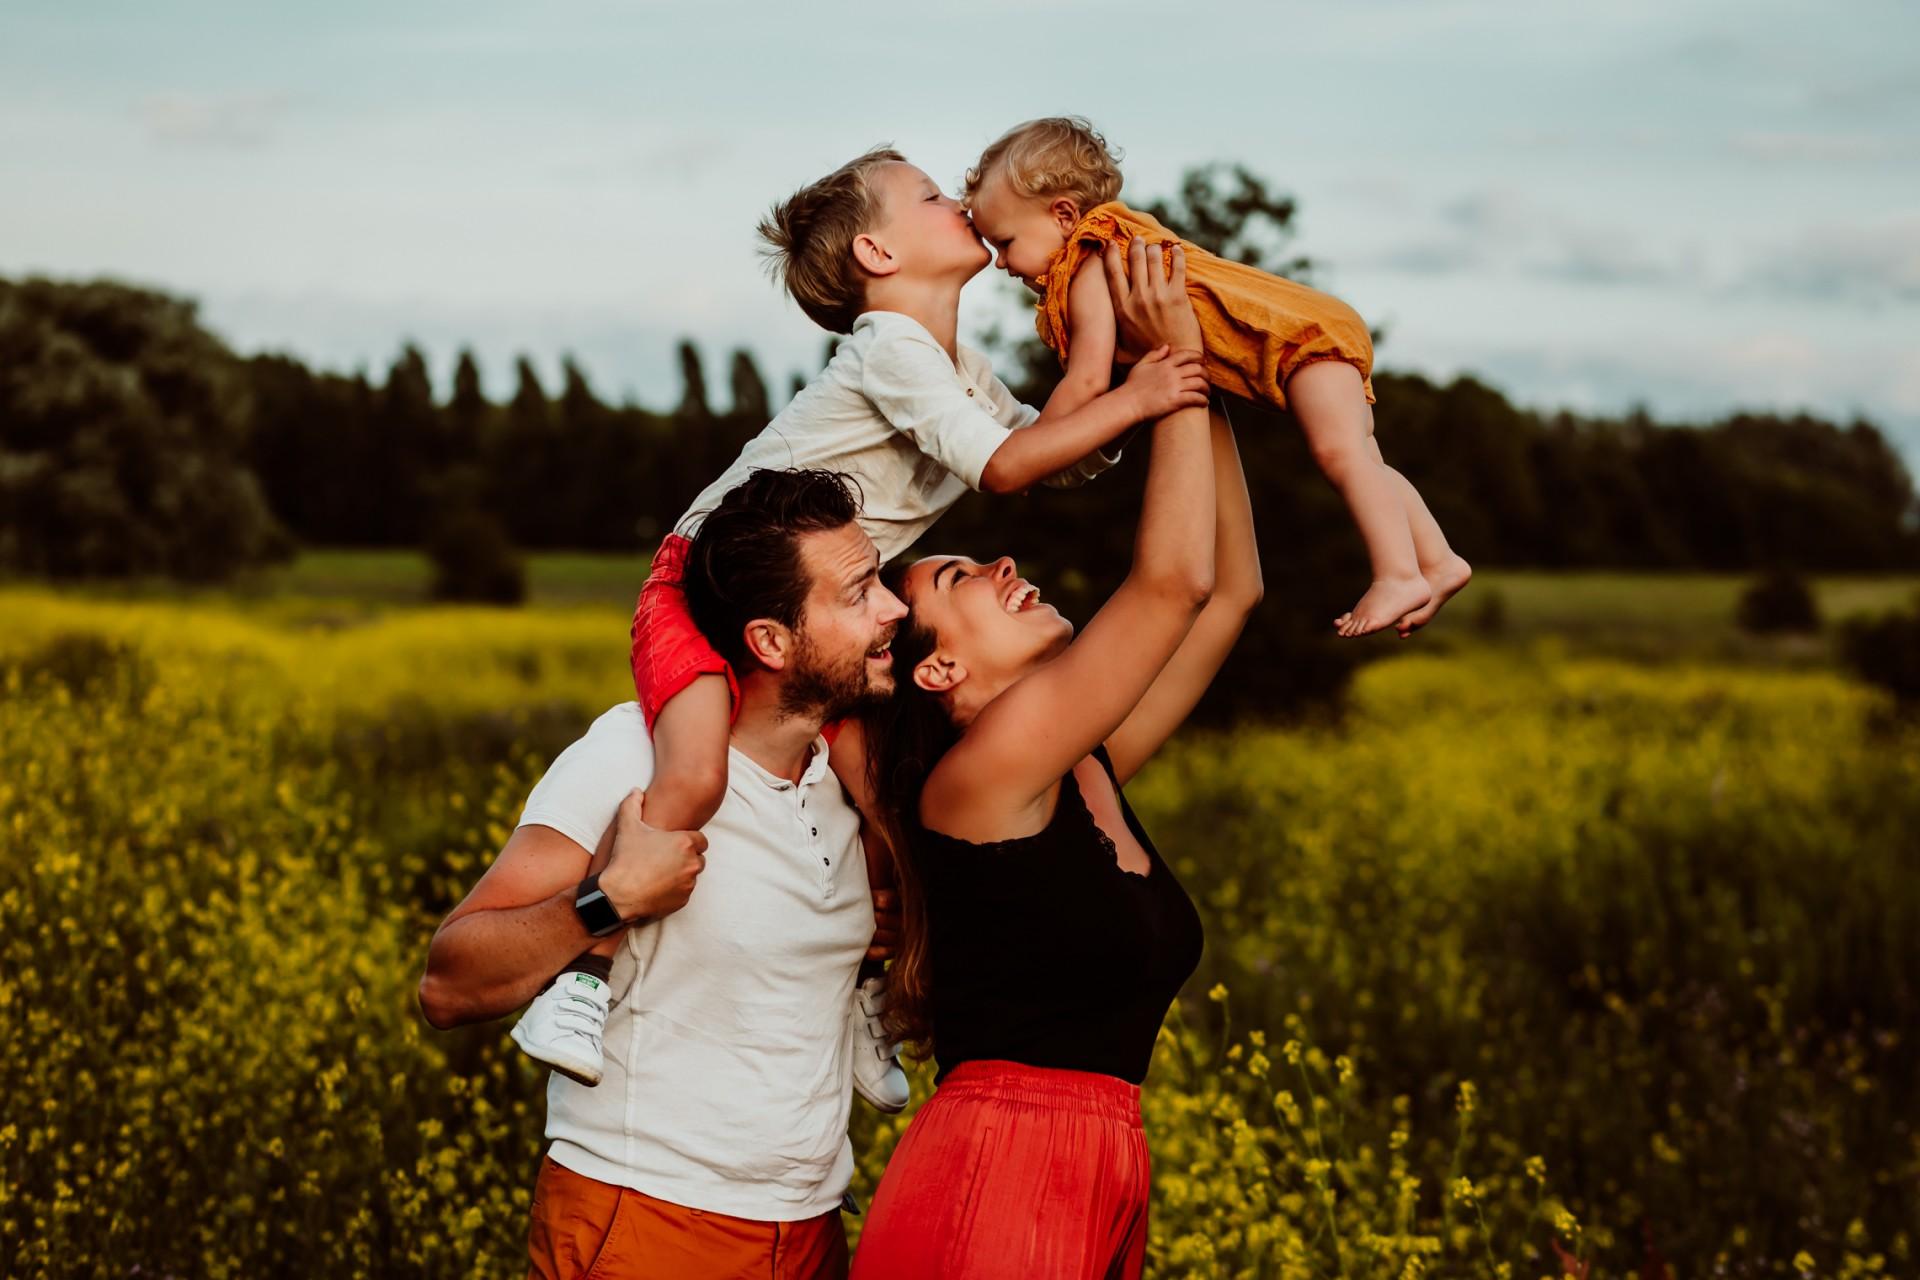 Familiefotografie Nijmegen, Elainefotografie Nijmegen